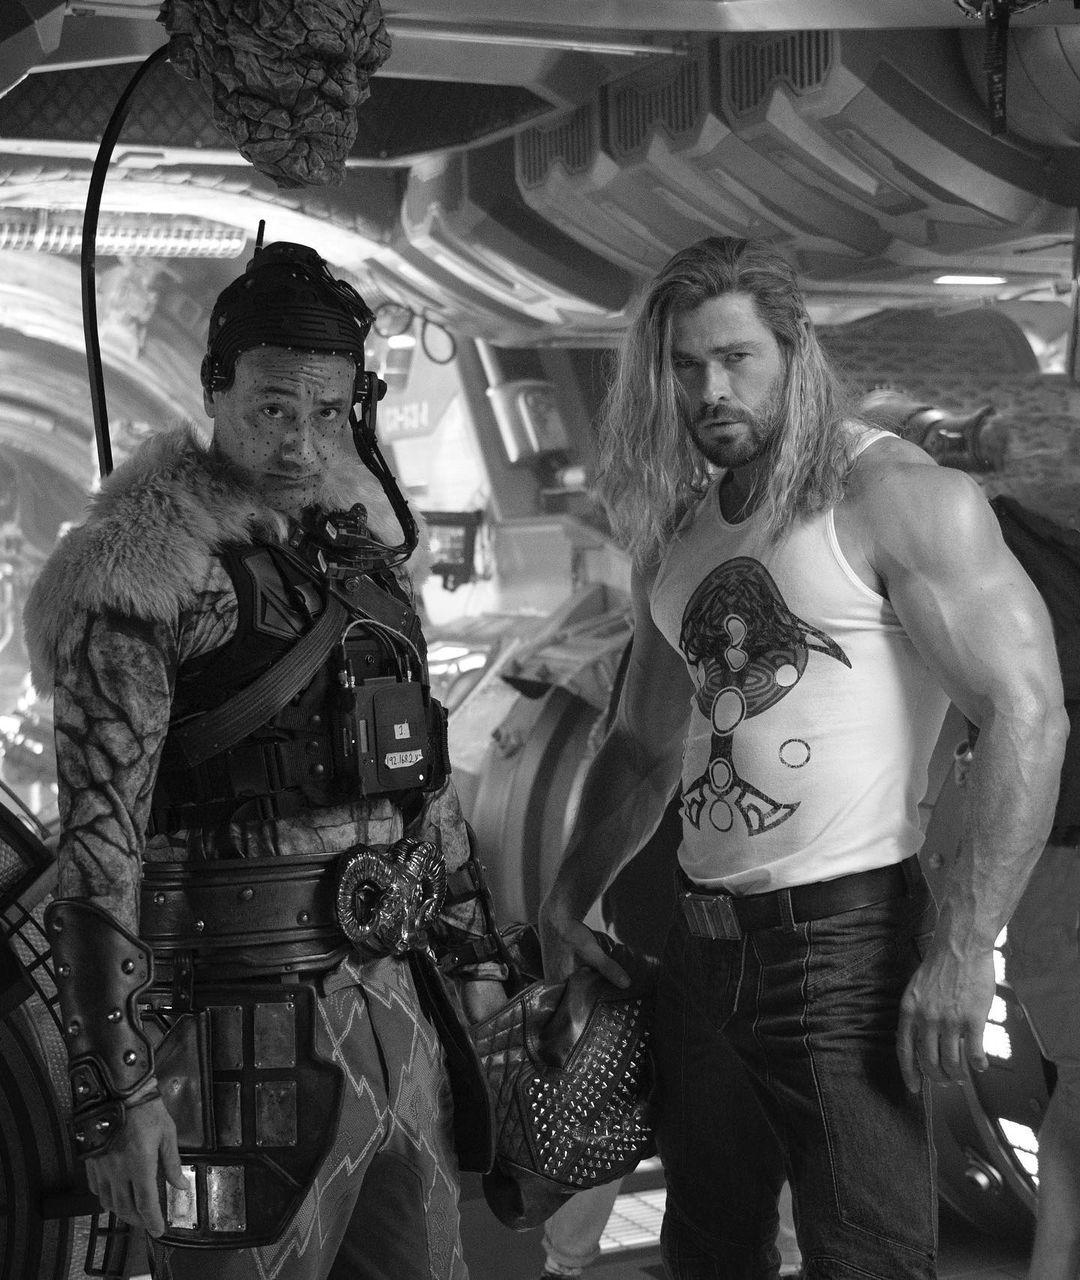 El co-guionista/director Taika Waititi como Korg y Chris Hemsworth como Thor en el set de Thor: Love and Thunder (2022). Imagen: Chris Hemsworth Instagram (@chrishemsworth).